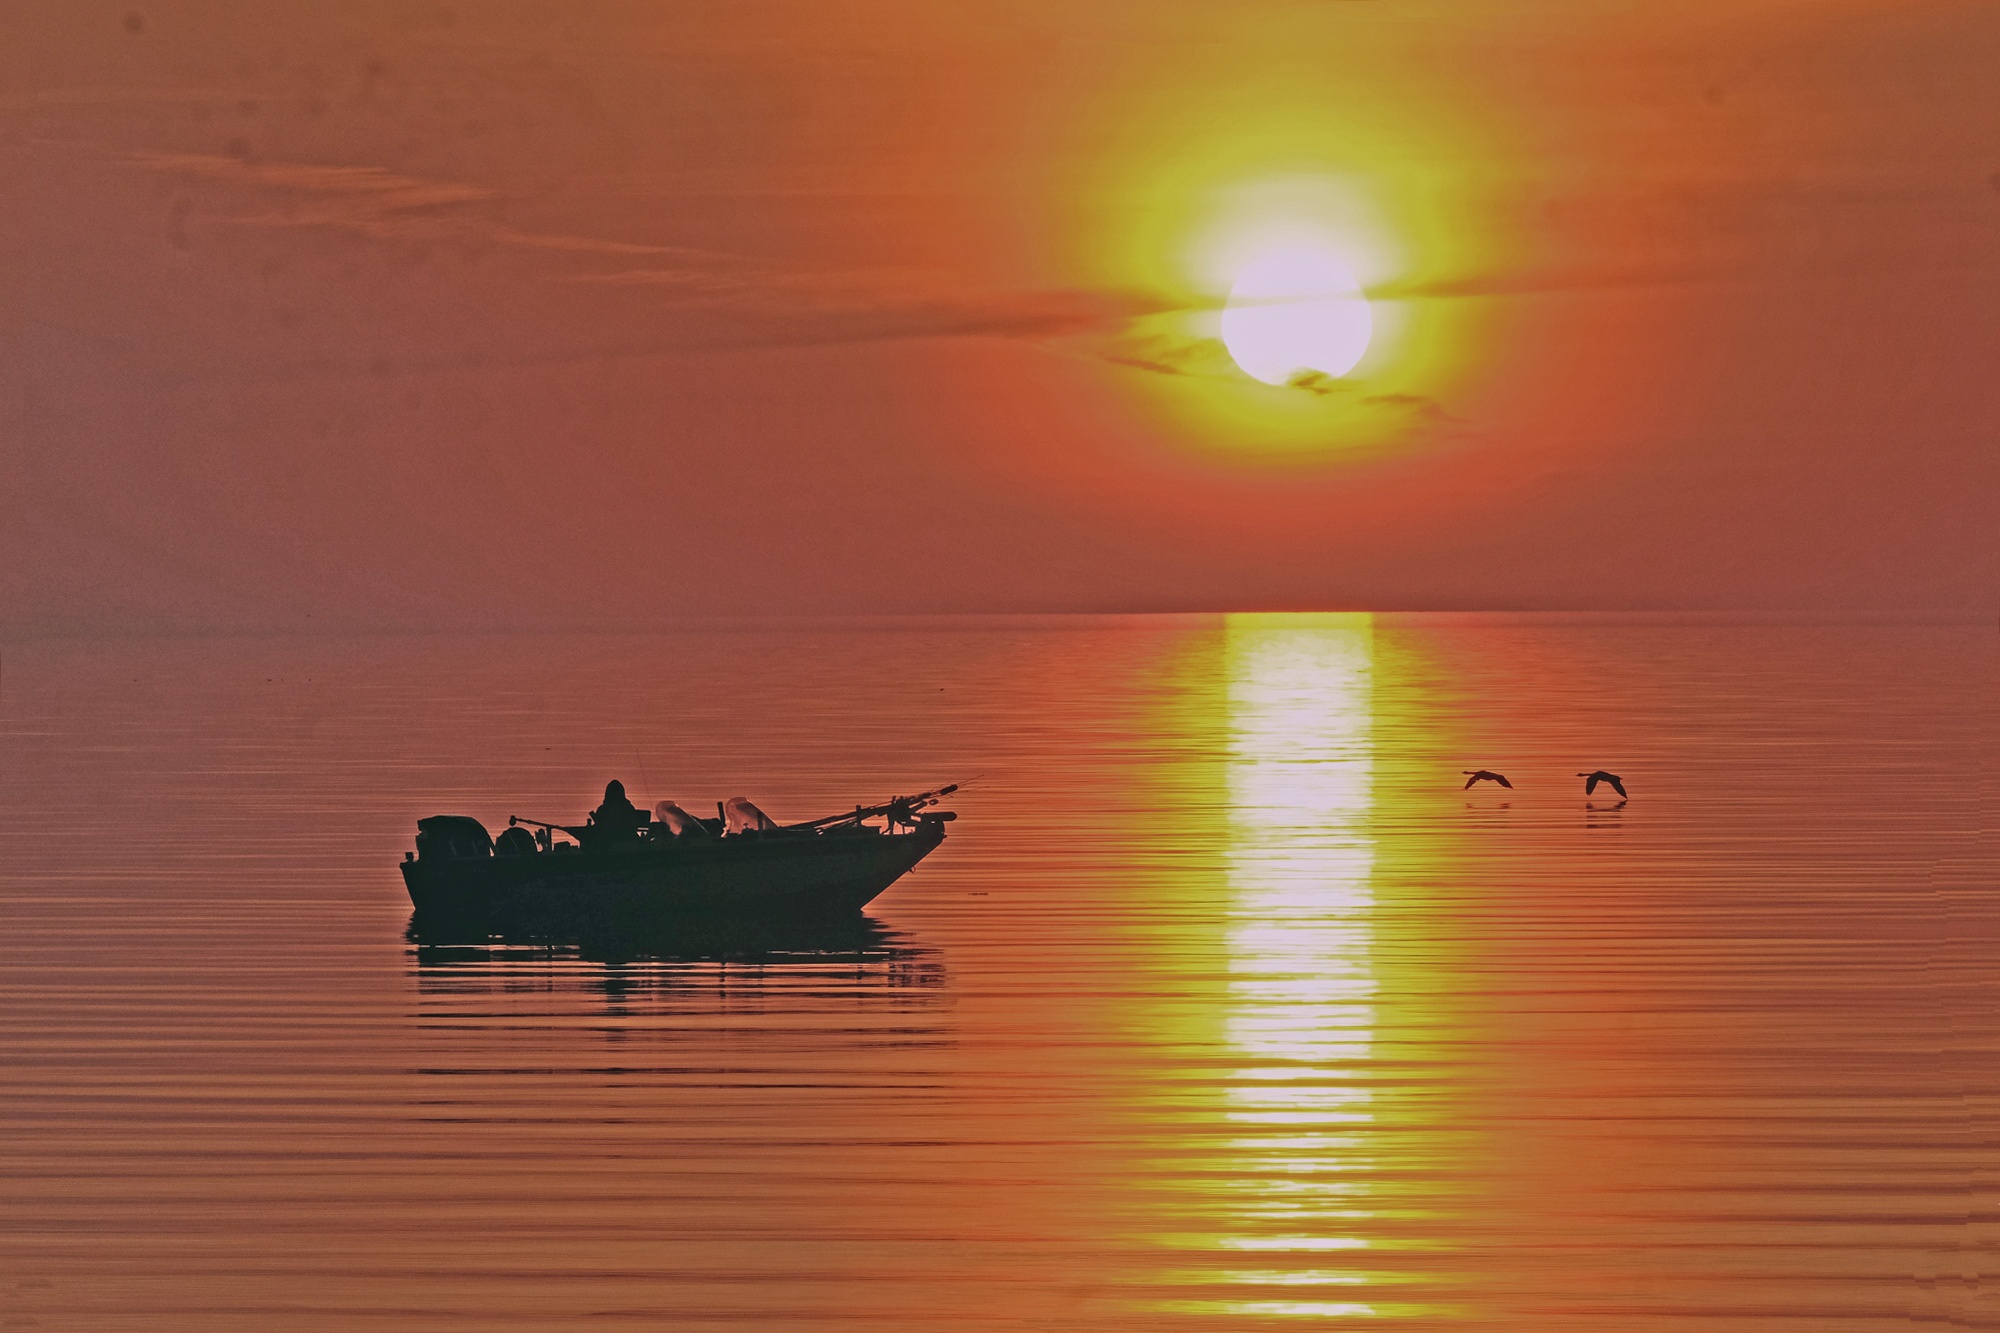 Sunrise Fisherman by Wovoka